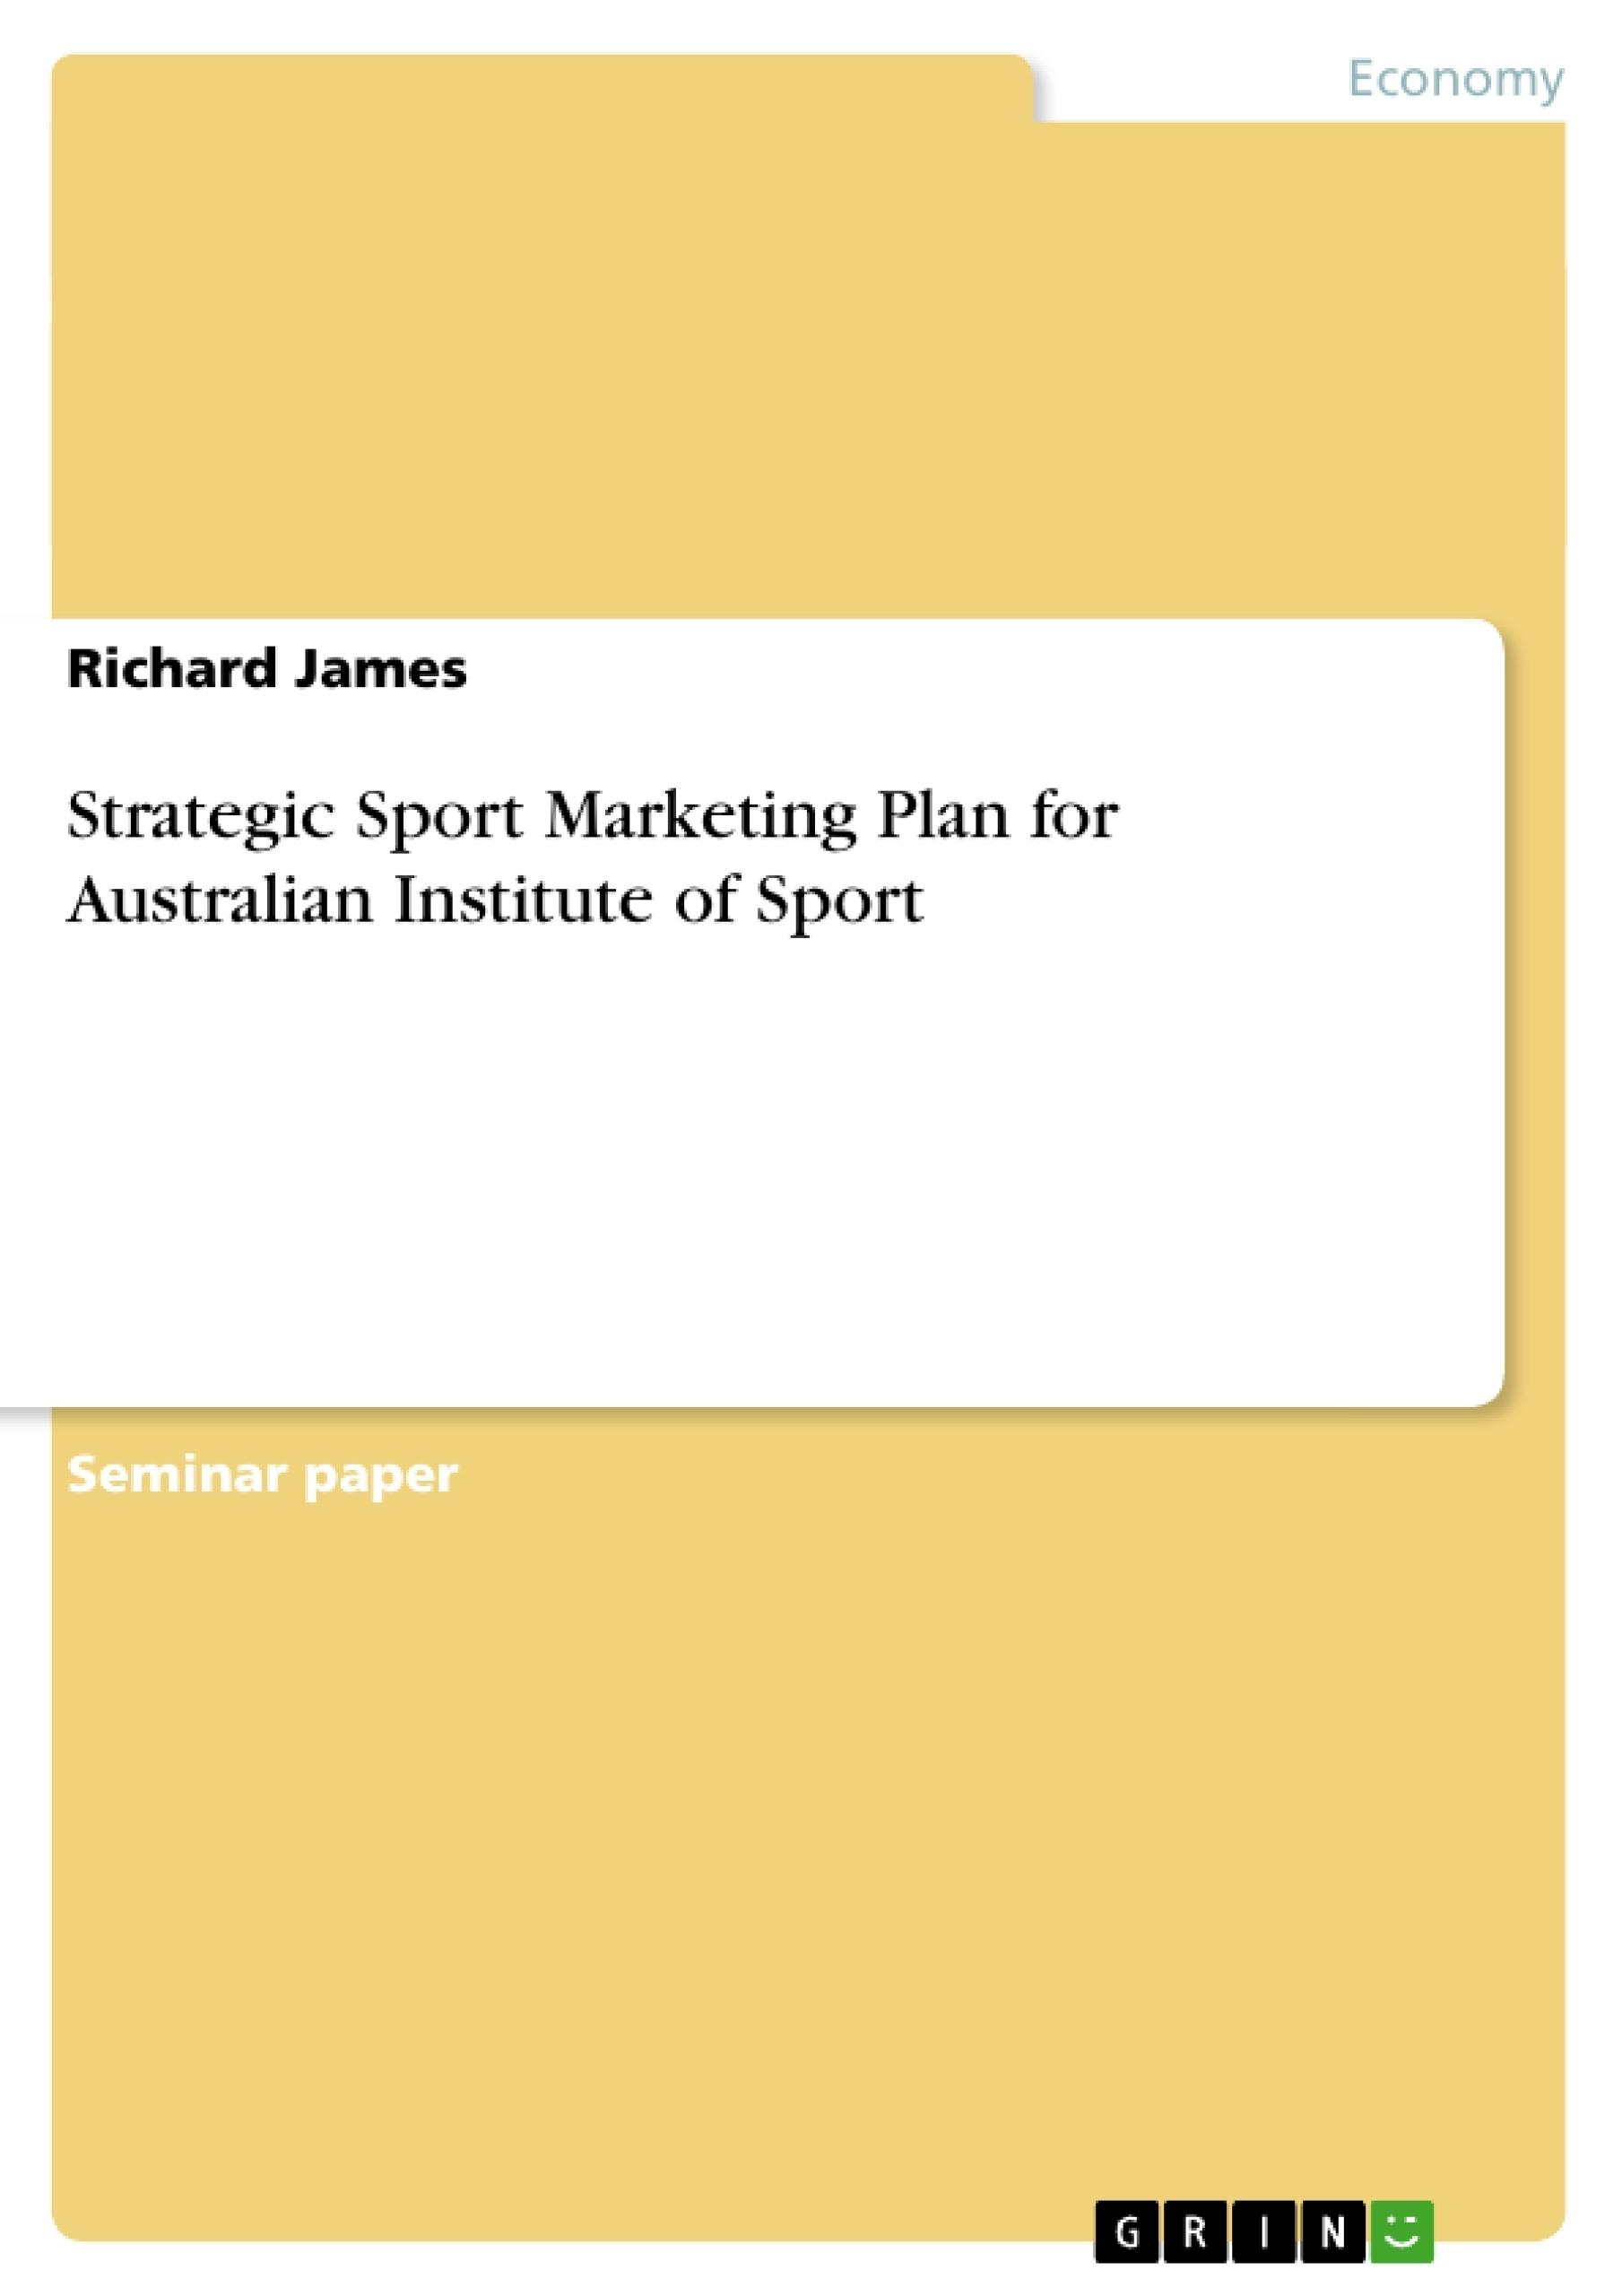 Title: Strategic Sport Marketing Plan for Australian Institute of Sport